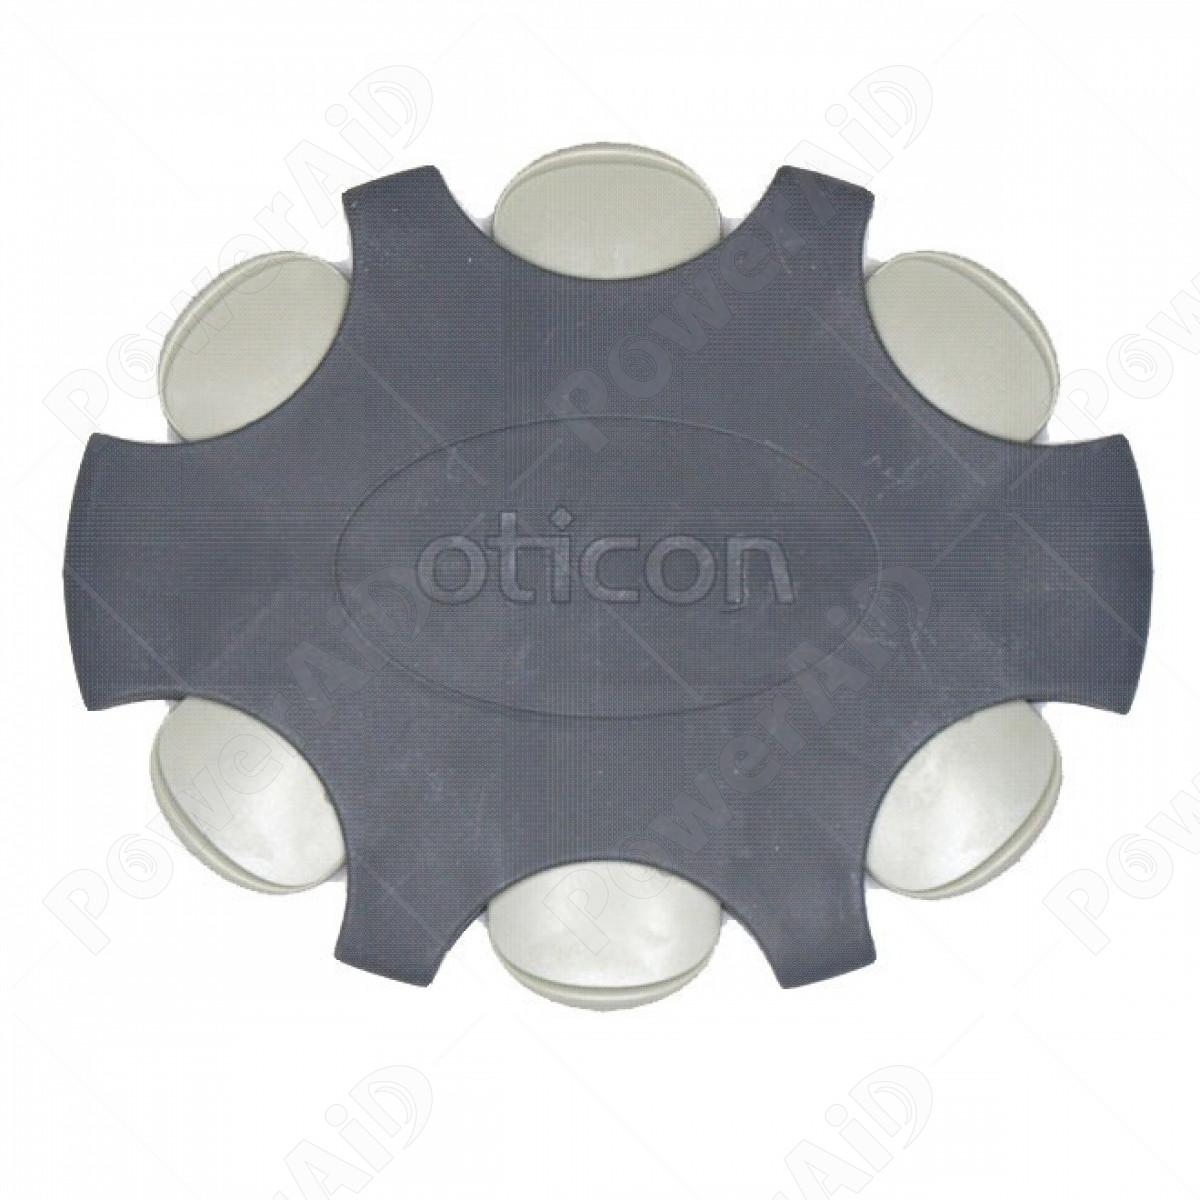 Oticon - Paracerume ProWax